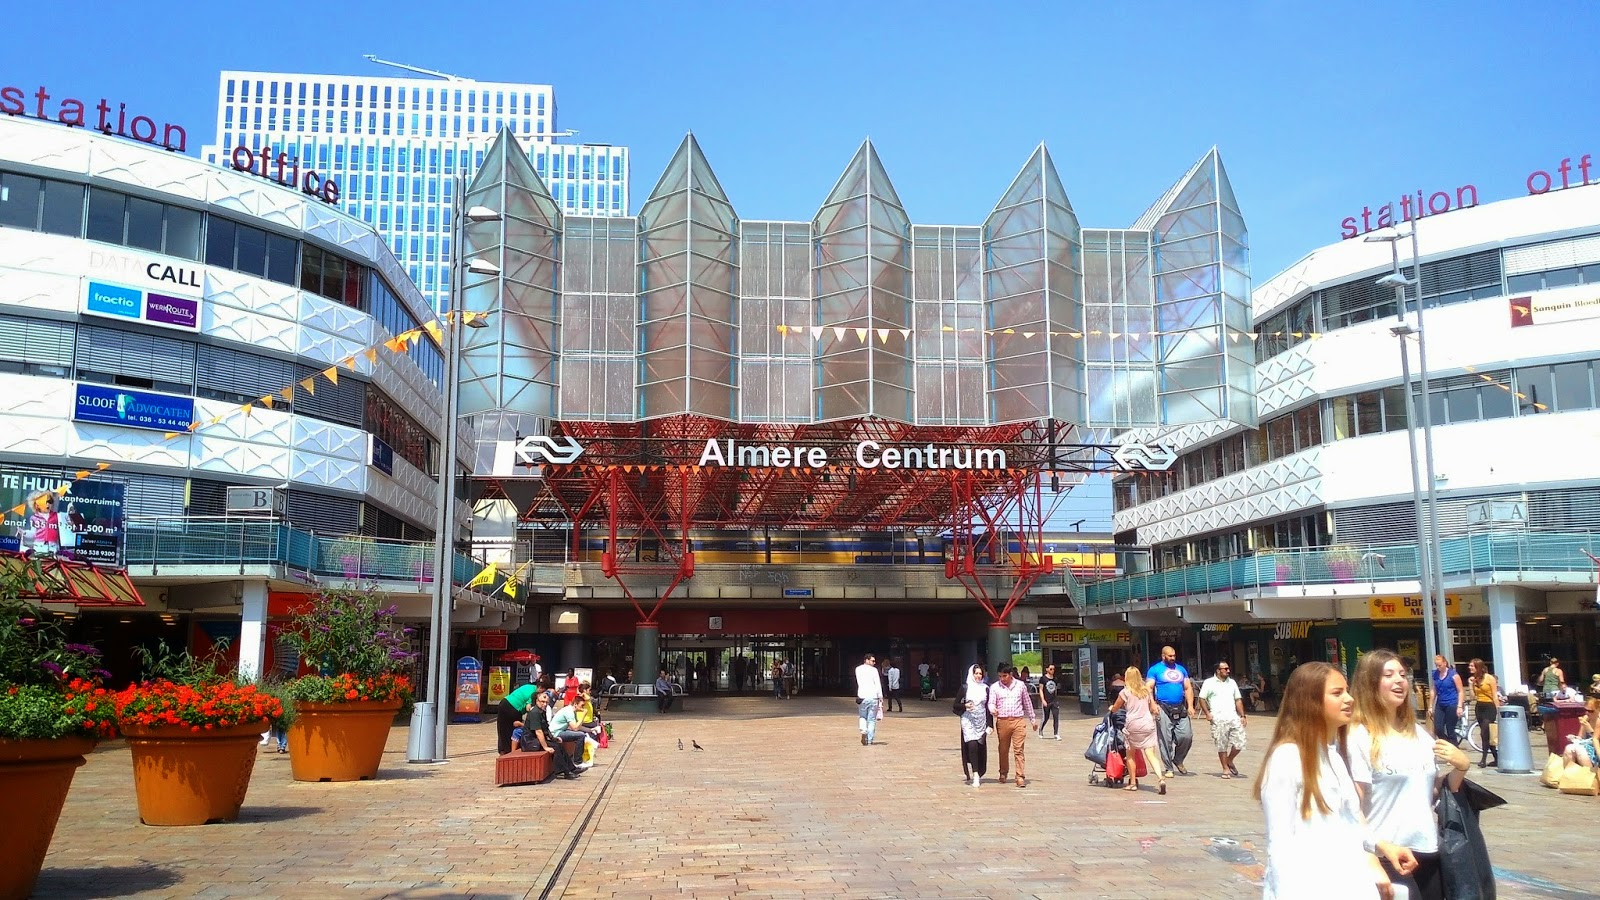 Almere Centrum Station